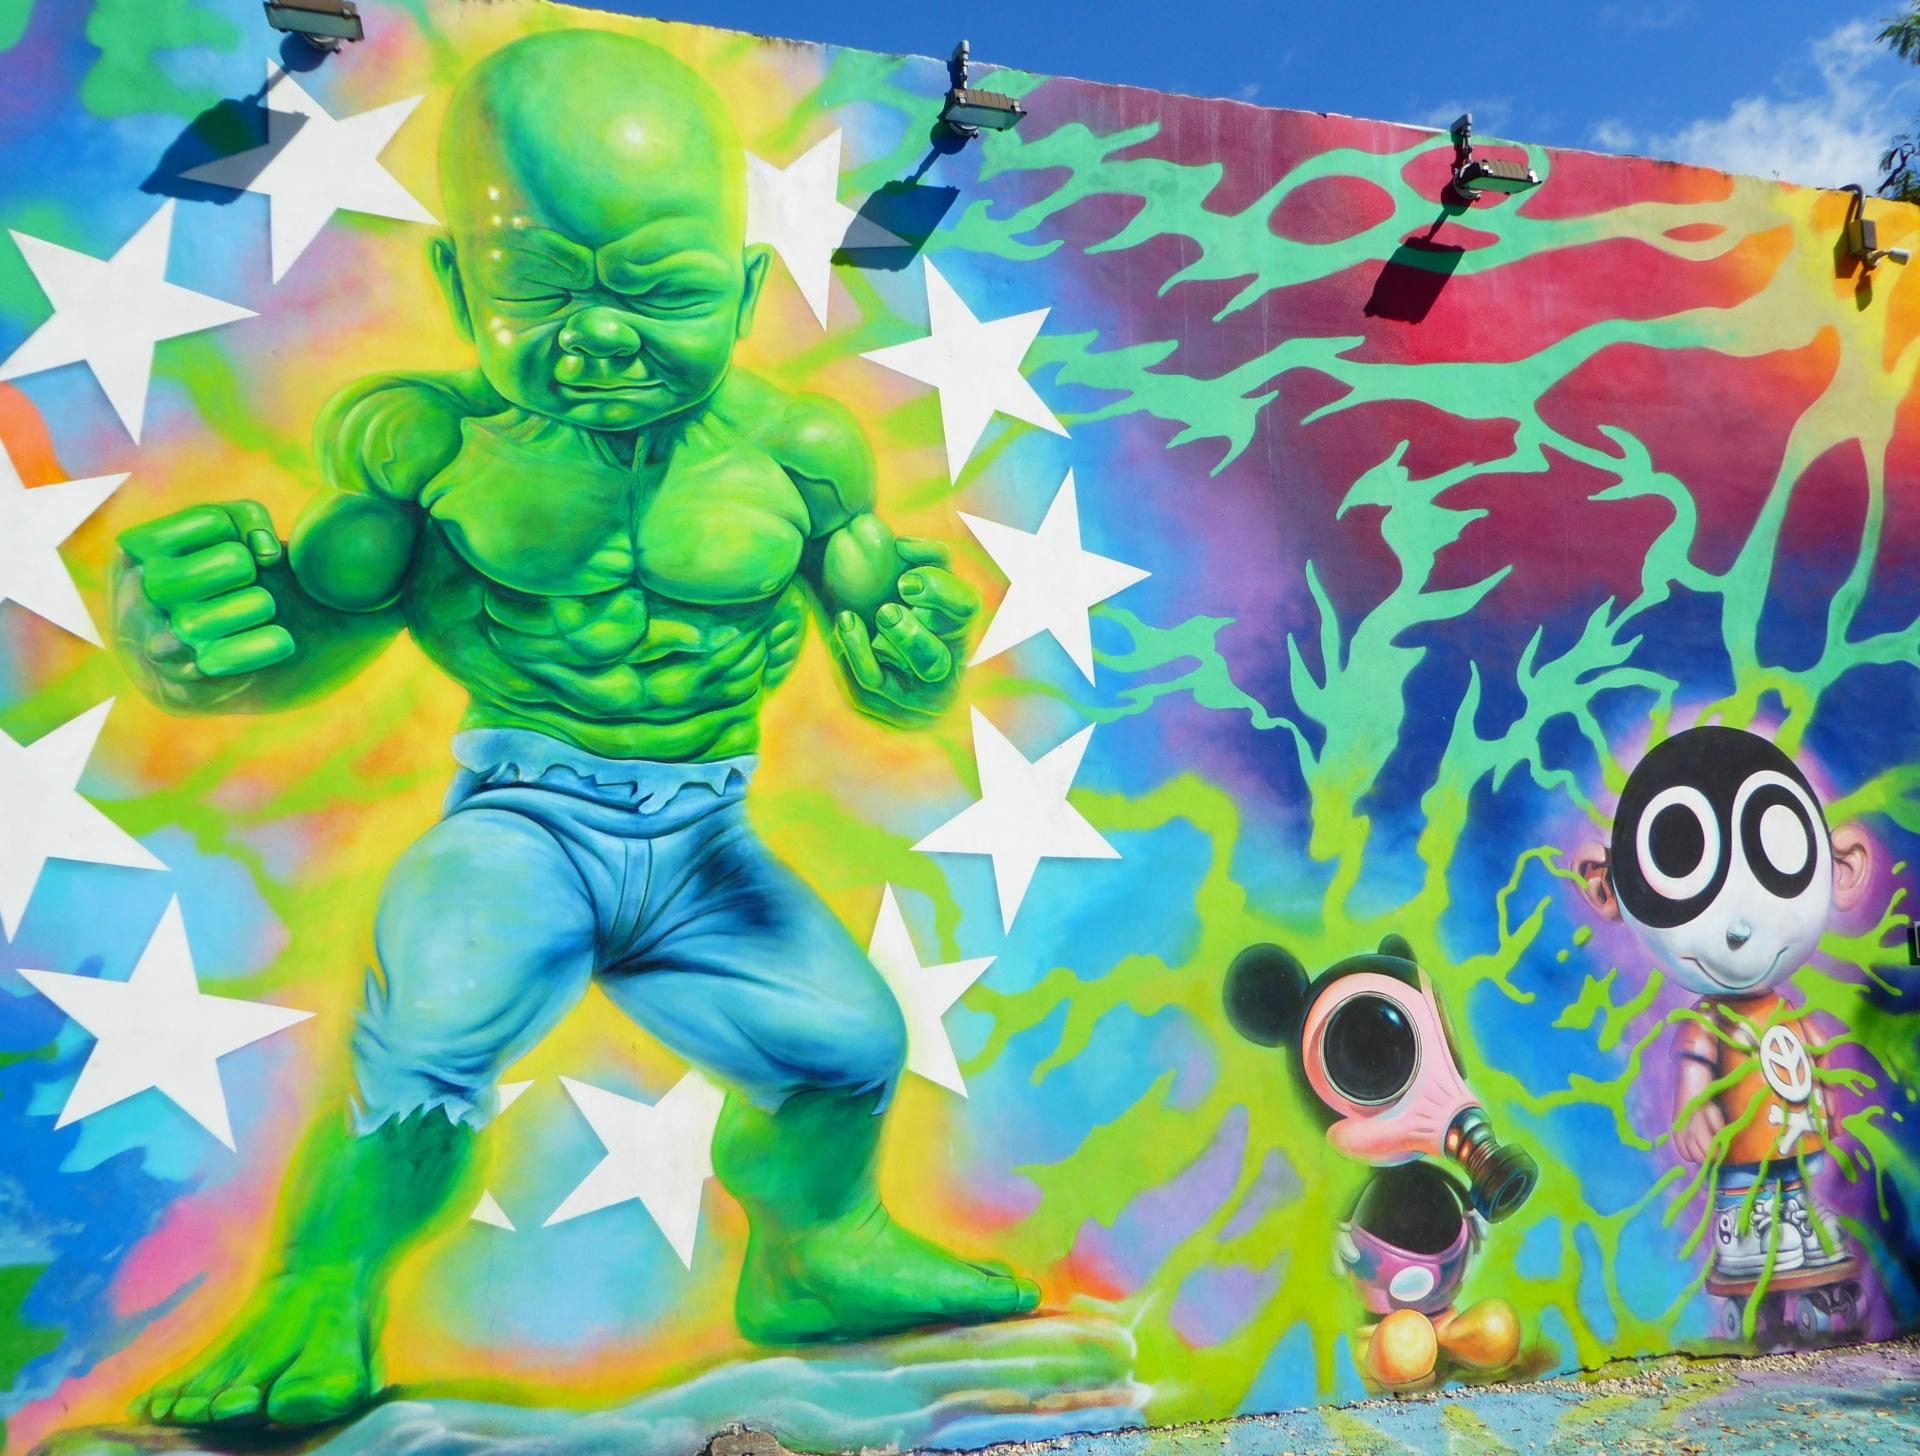 wynwood walls miami florida street art colourful baby hulk